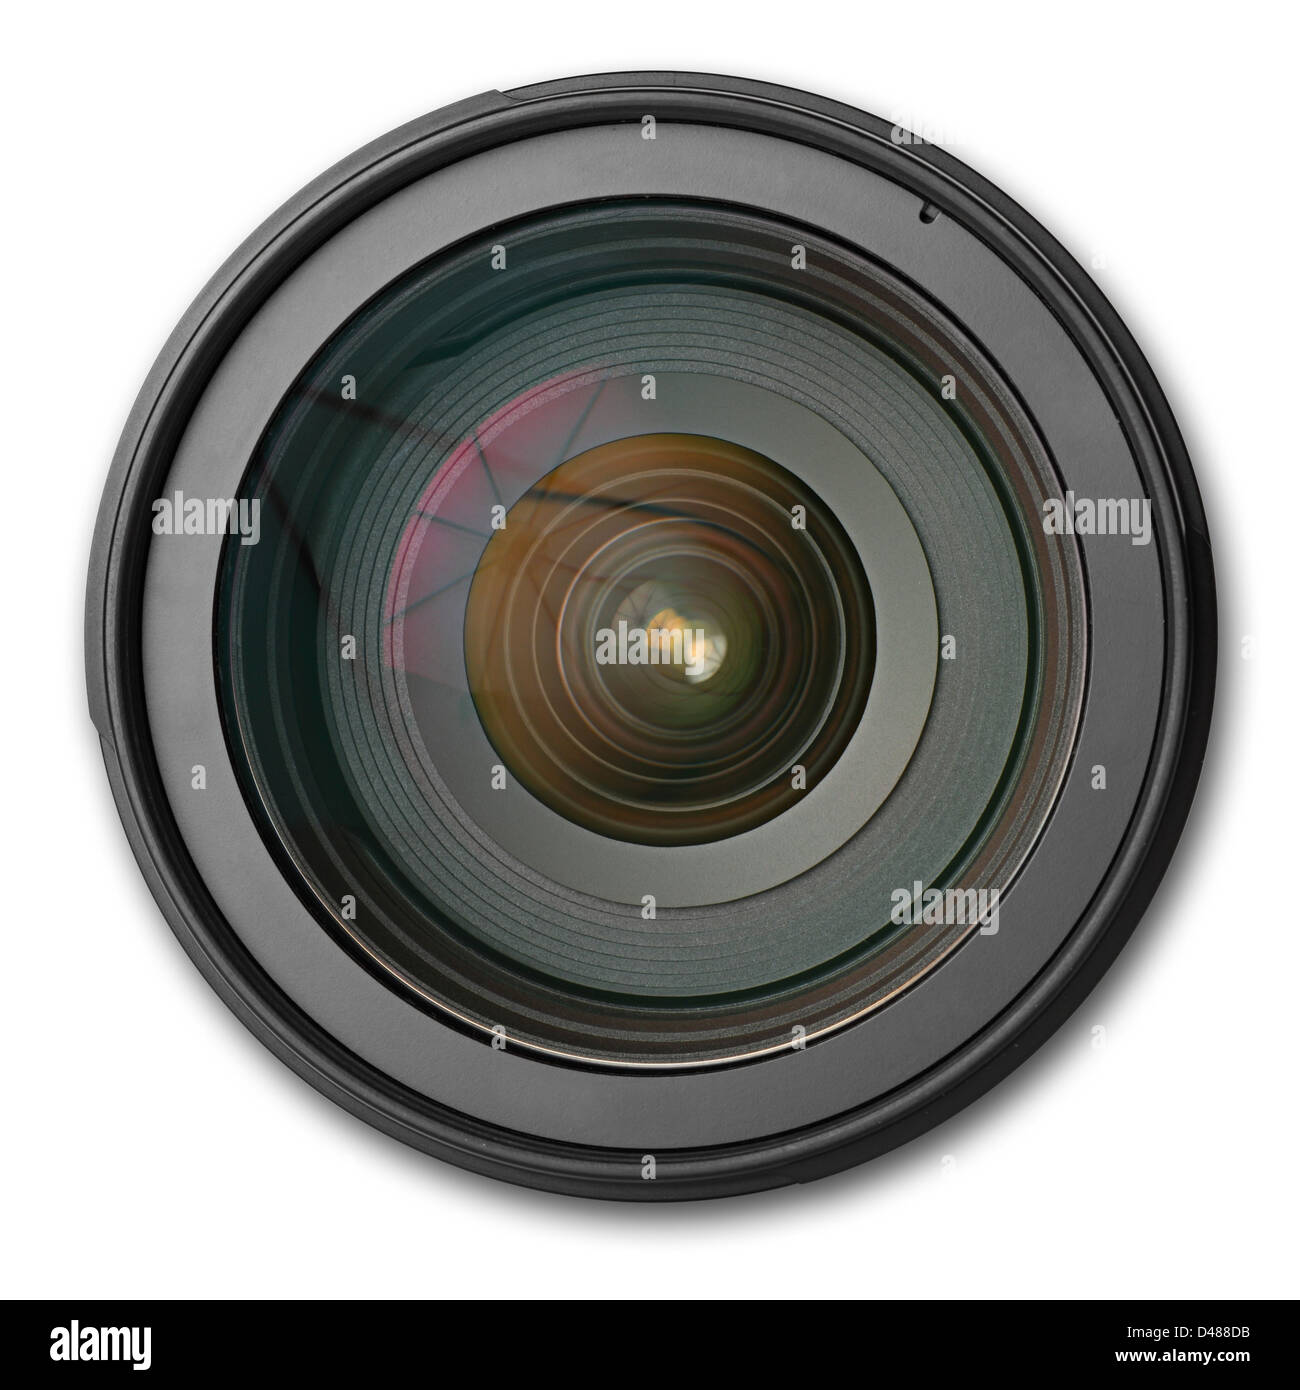 a dslr lens on white background - Stock Image